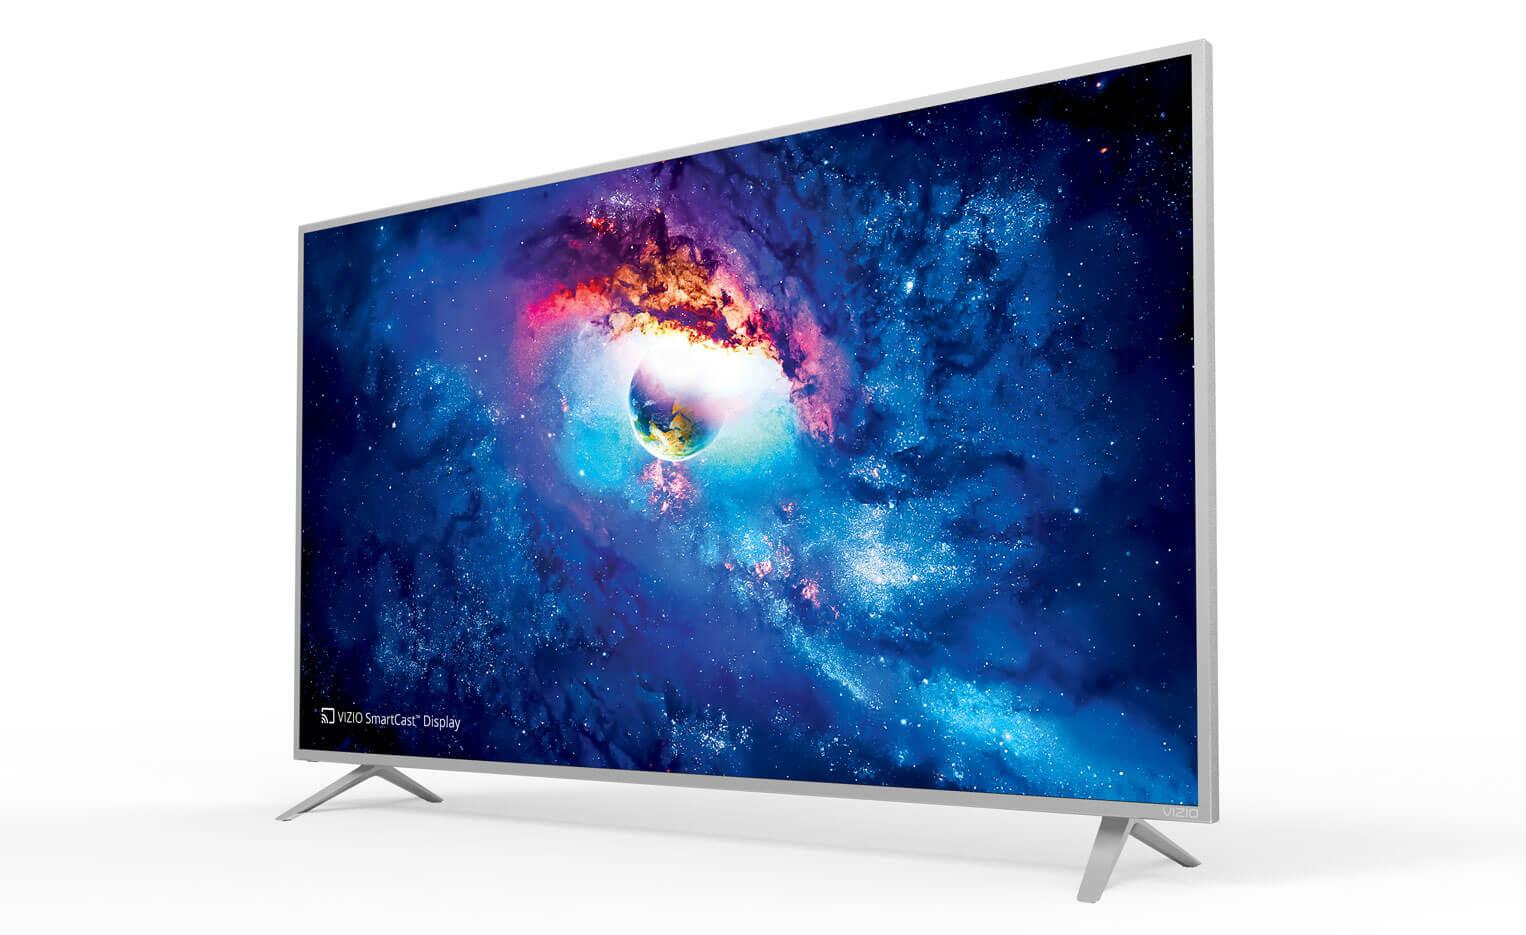 Vizio XLED TV 00